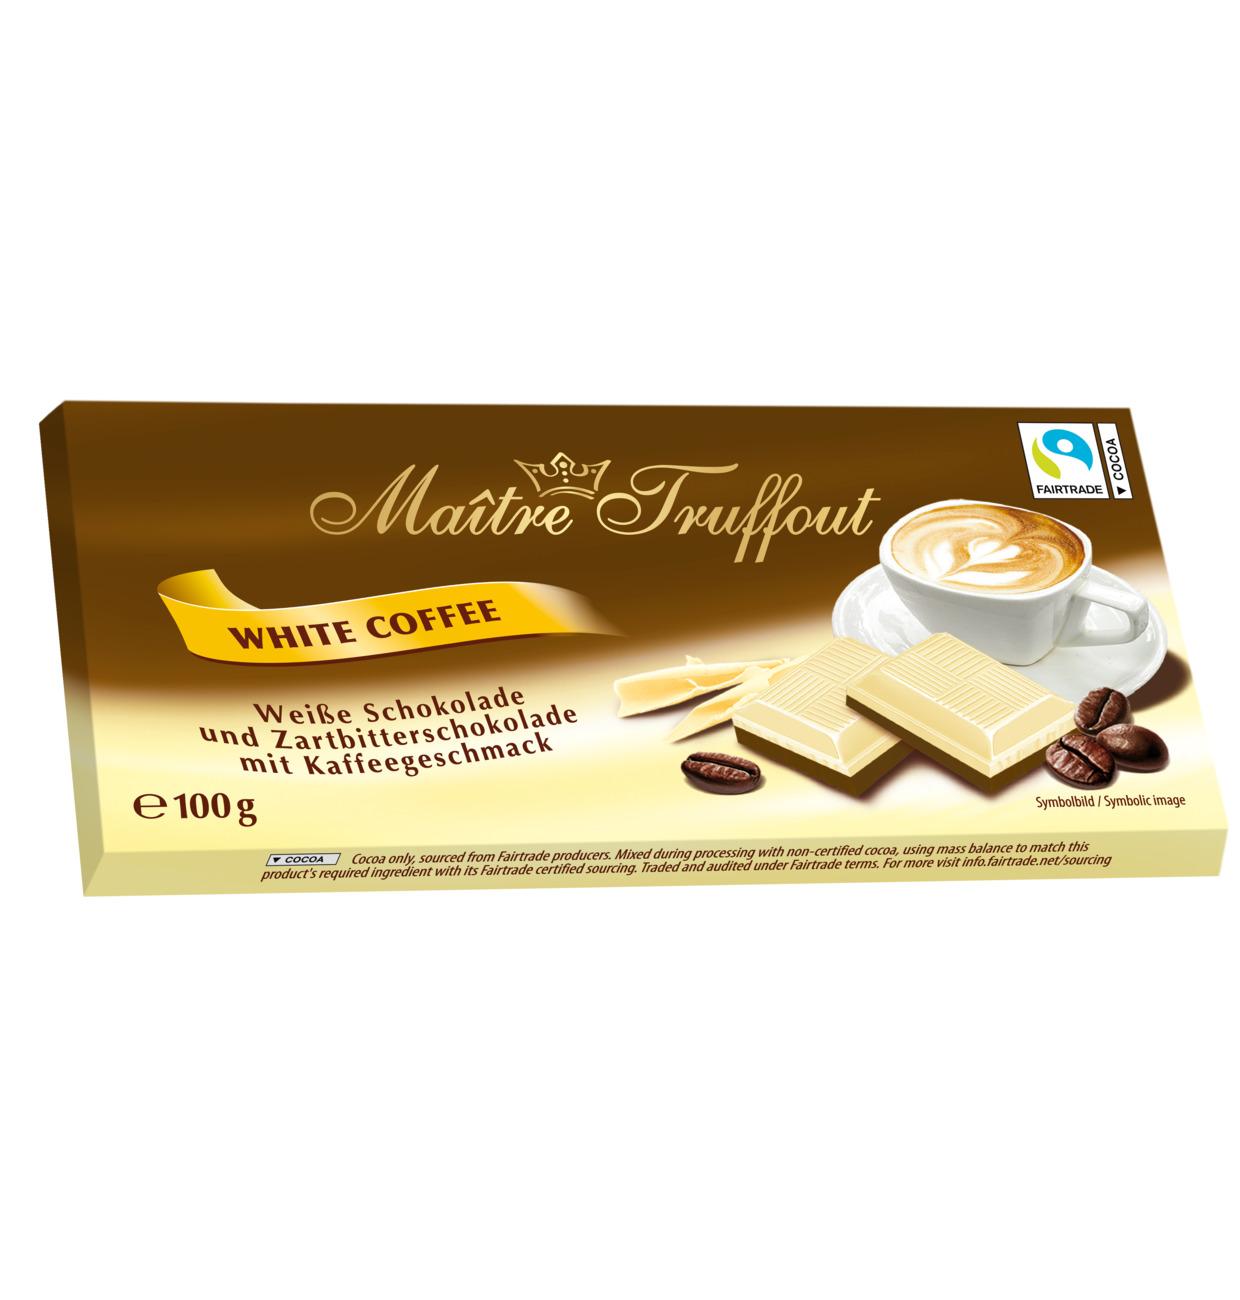 Weisse Schokolade mit Kaffeeschokolade 100g